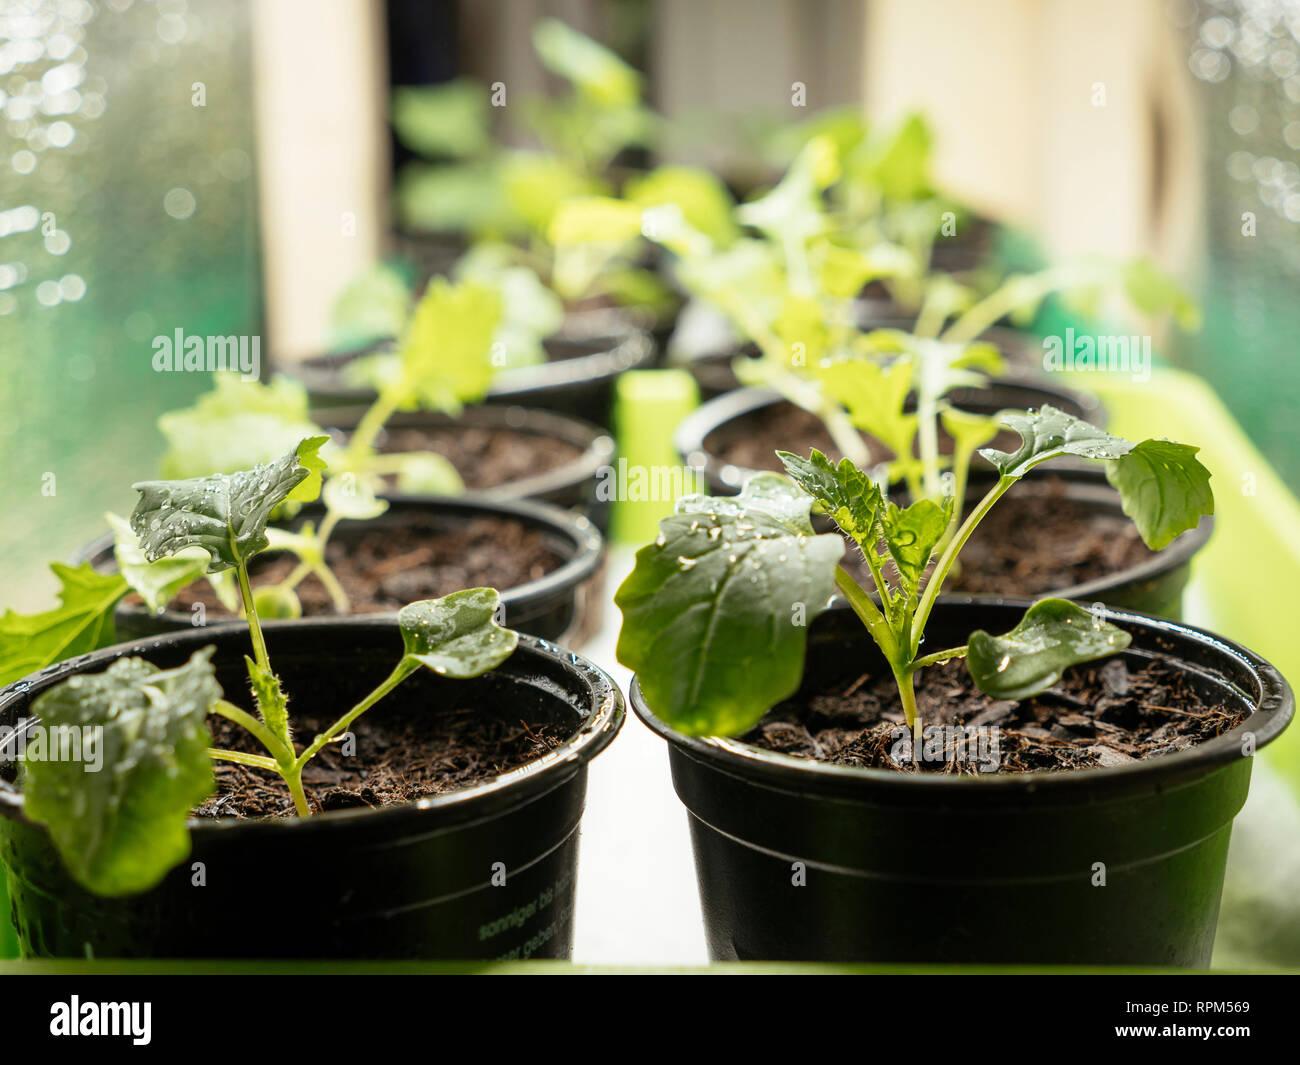 Namenia (Brassica rapa L. var. rapa) and Siberian kale (Brassica napus var. pabularia) seedlings growing inside under a grow light. Stock Photo